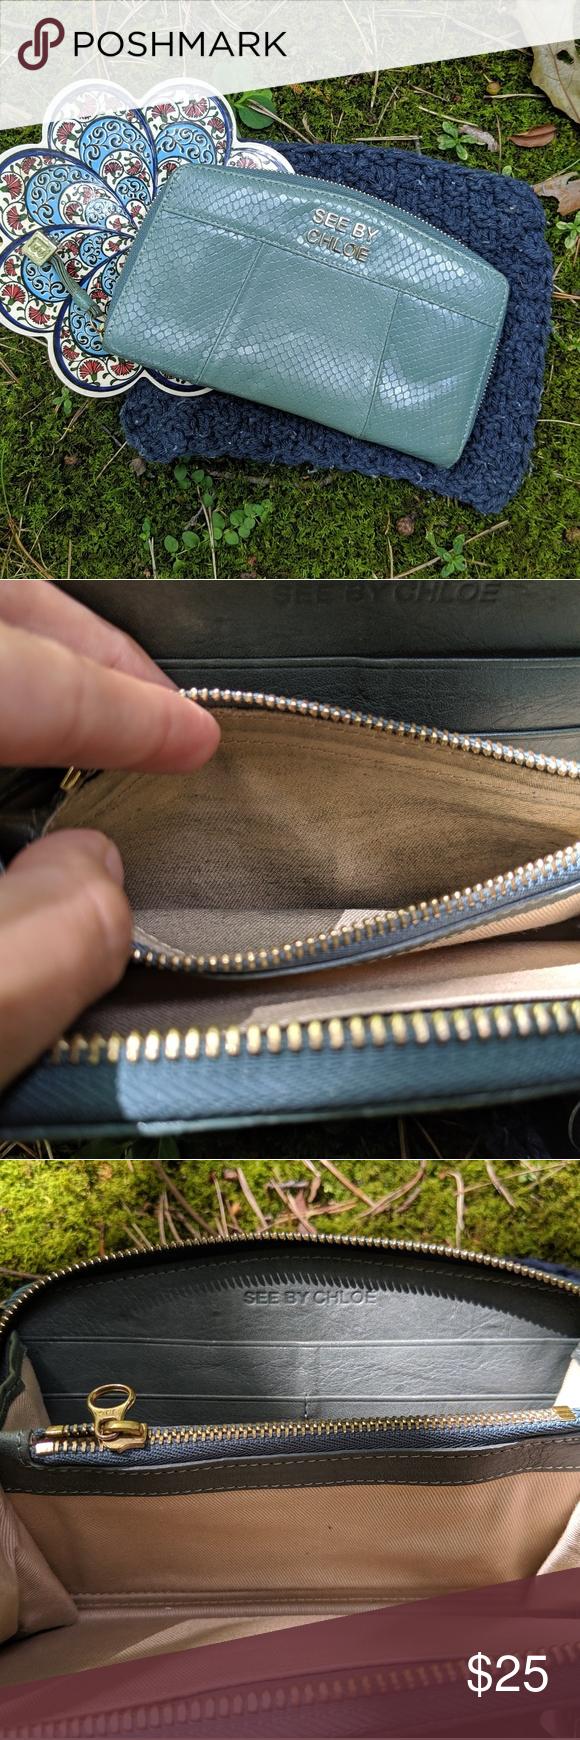 See By Chloe Zip Around Long Wallet SEE BY CHLOE Zip Around Long Wallet in good condition. Approx. 8 x 5 x 1 See By Chloe Bags Wallets #seebychloe